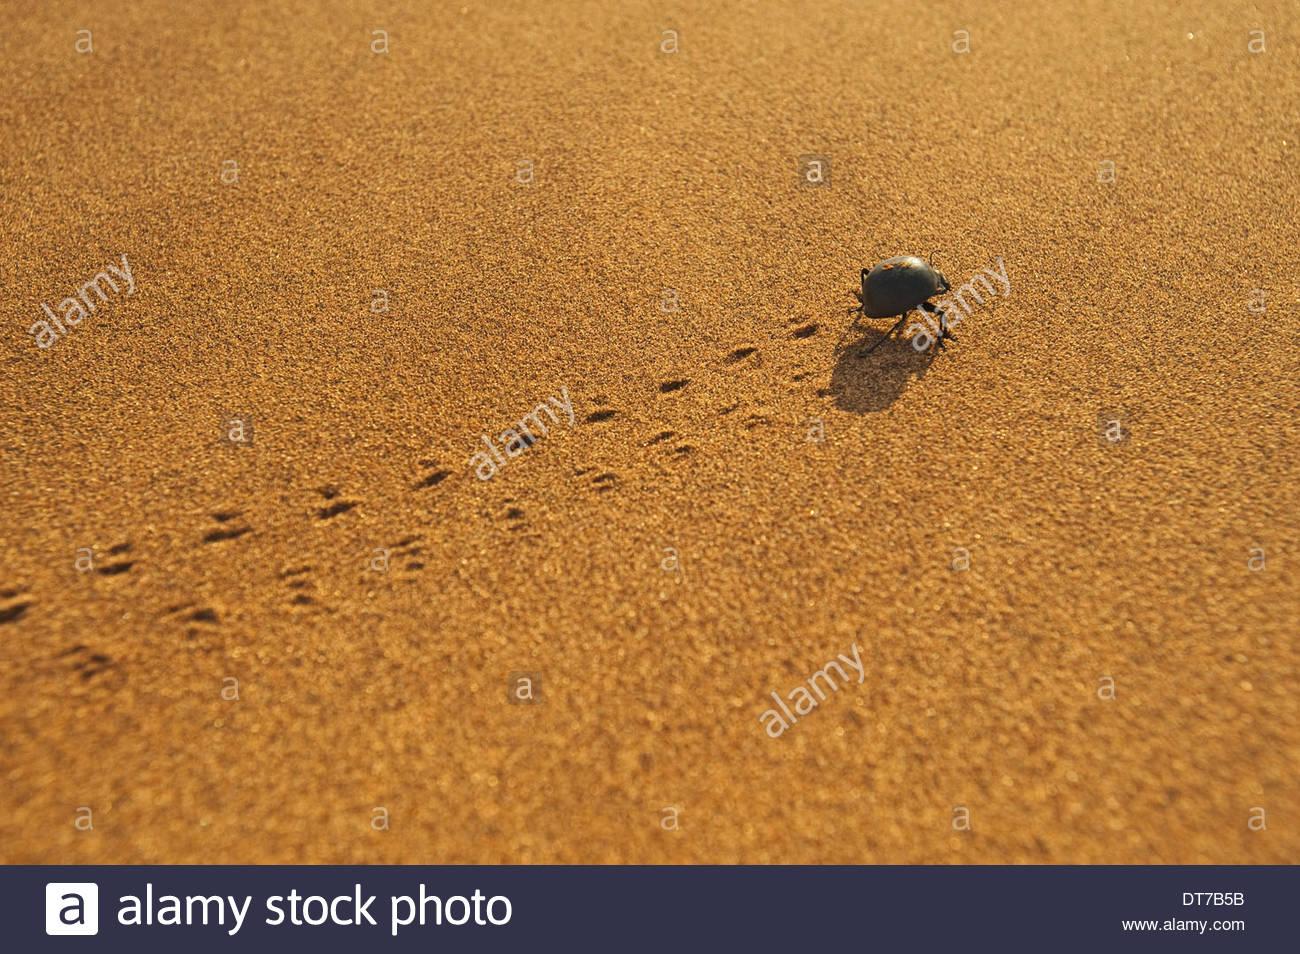 Beetle crossing sand dune Sperrgebiet National Park Namibia Sperrgebiet National Park Namibia - Stock Image